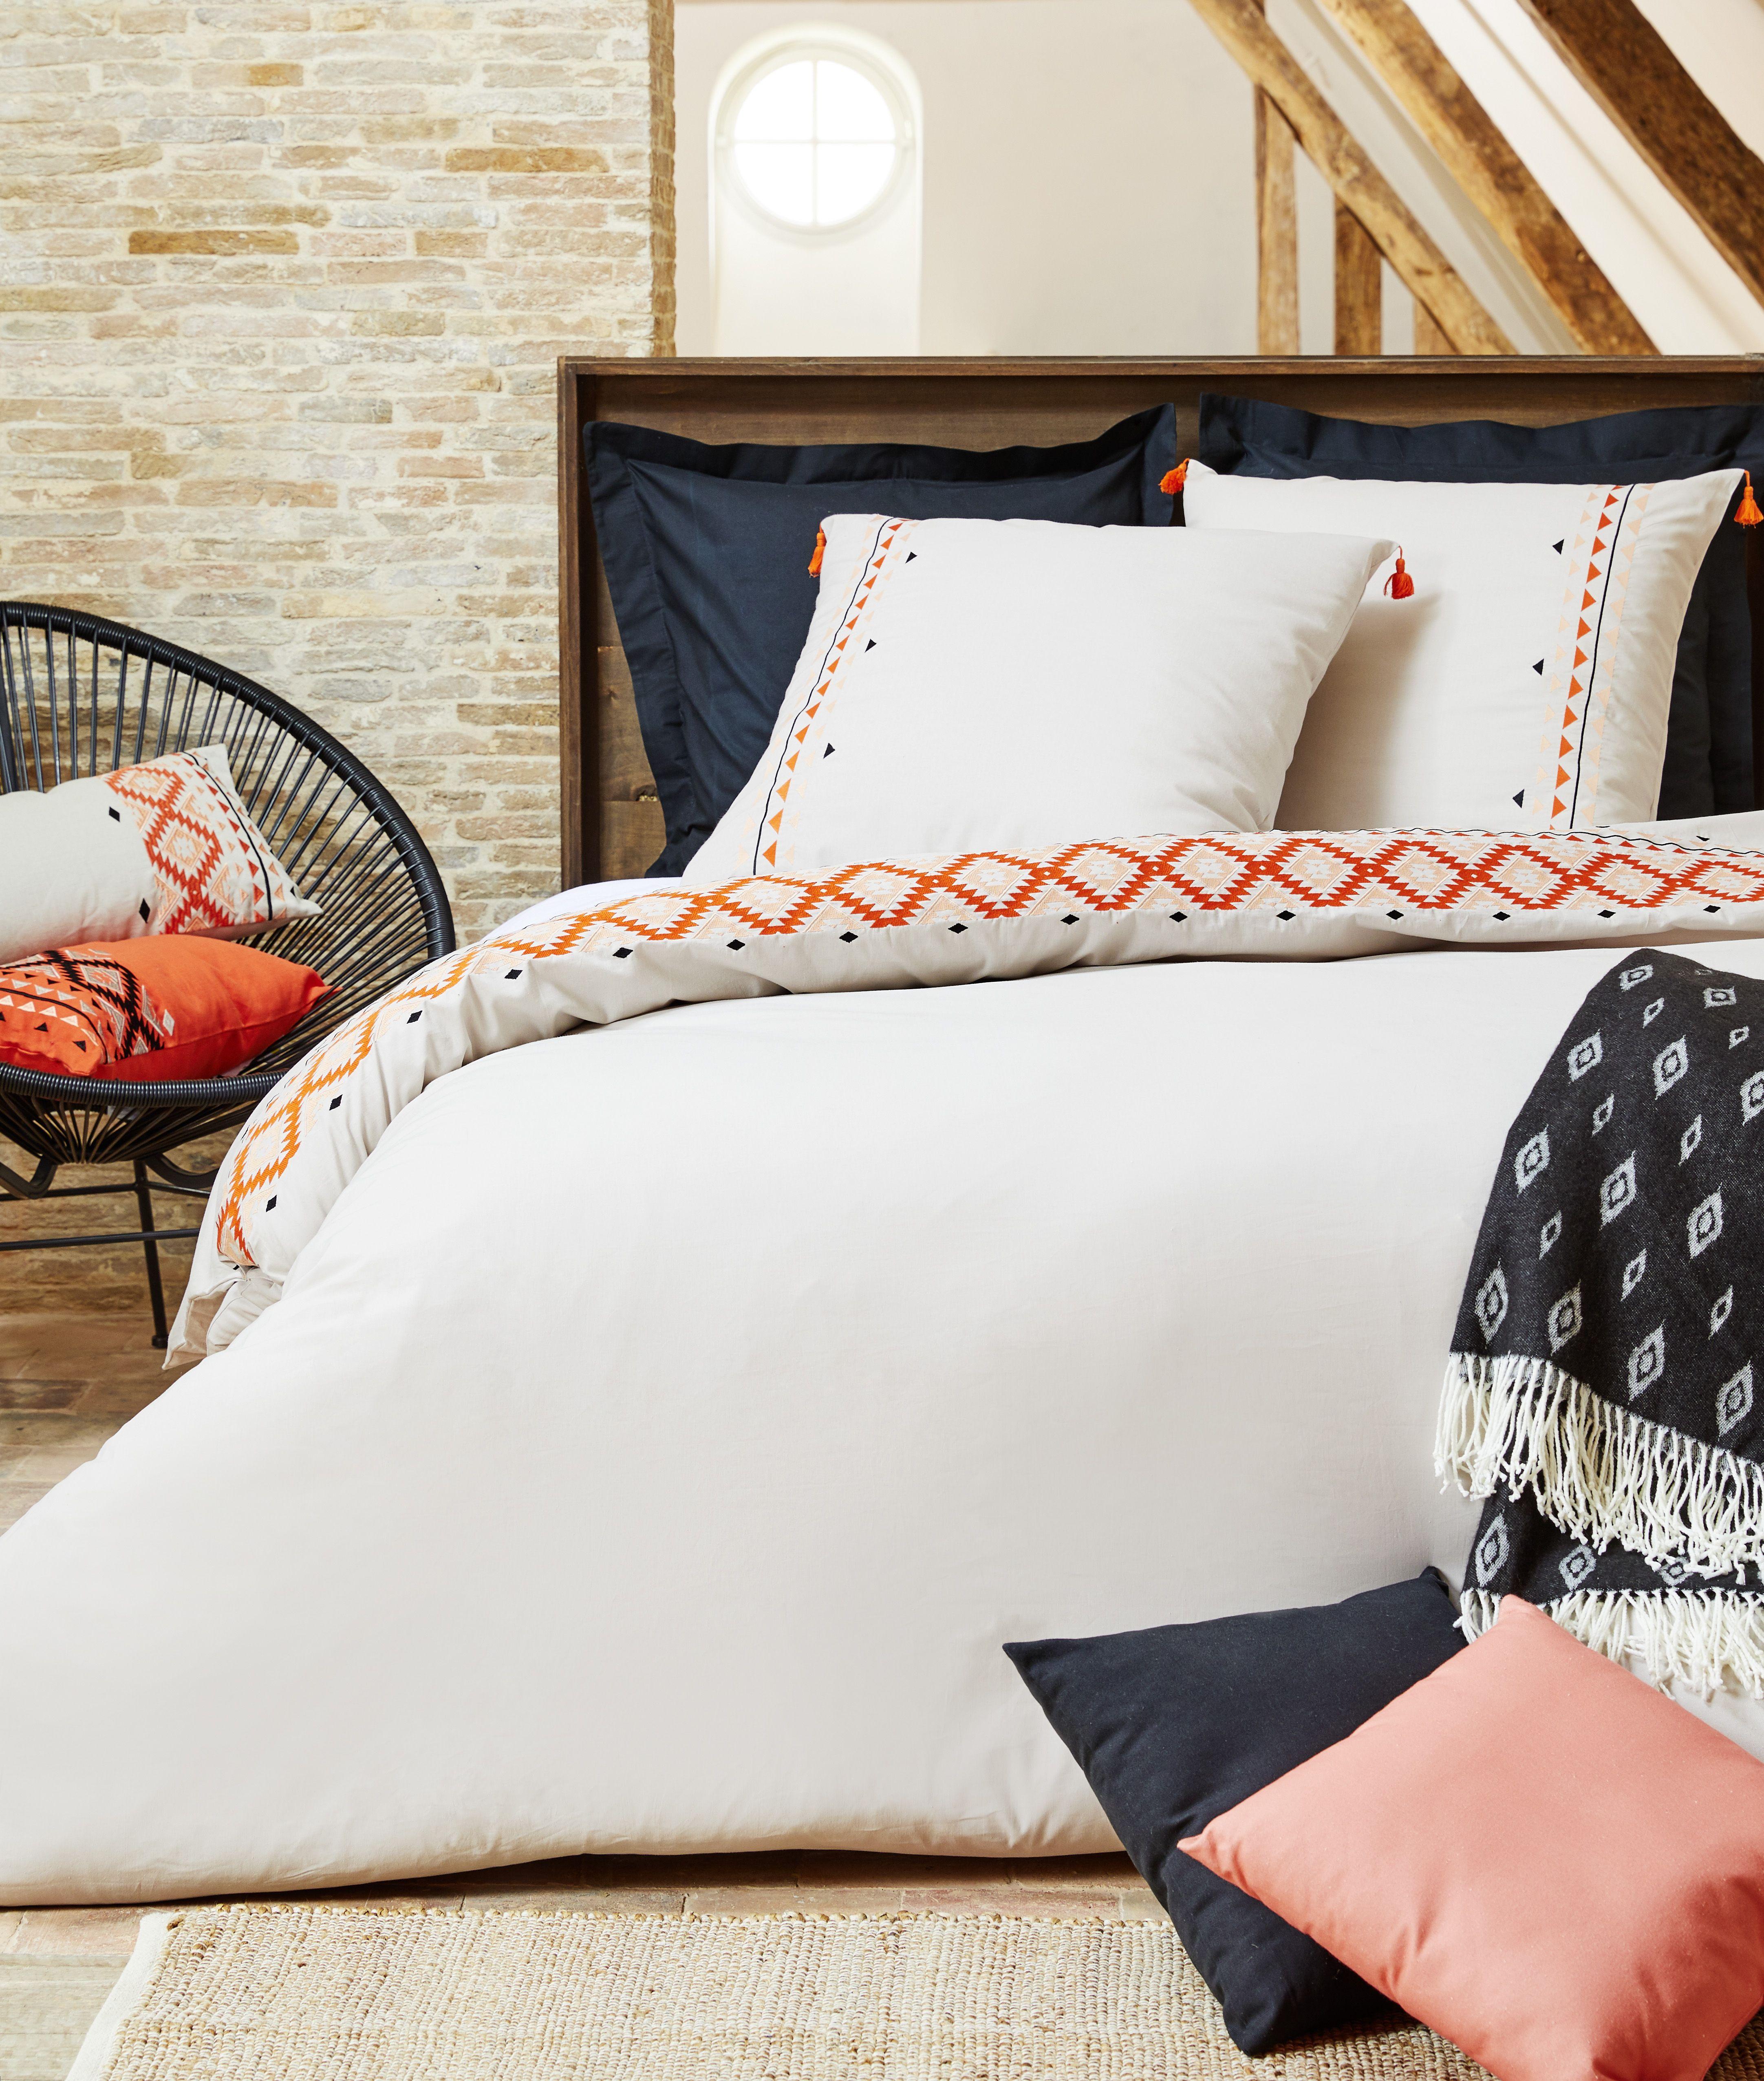 guirlande lumineuse carrefour guirlande lumineuse. Black Bedroom Furniture Sets. Home Design Ideas